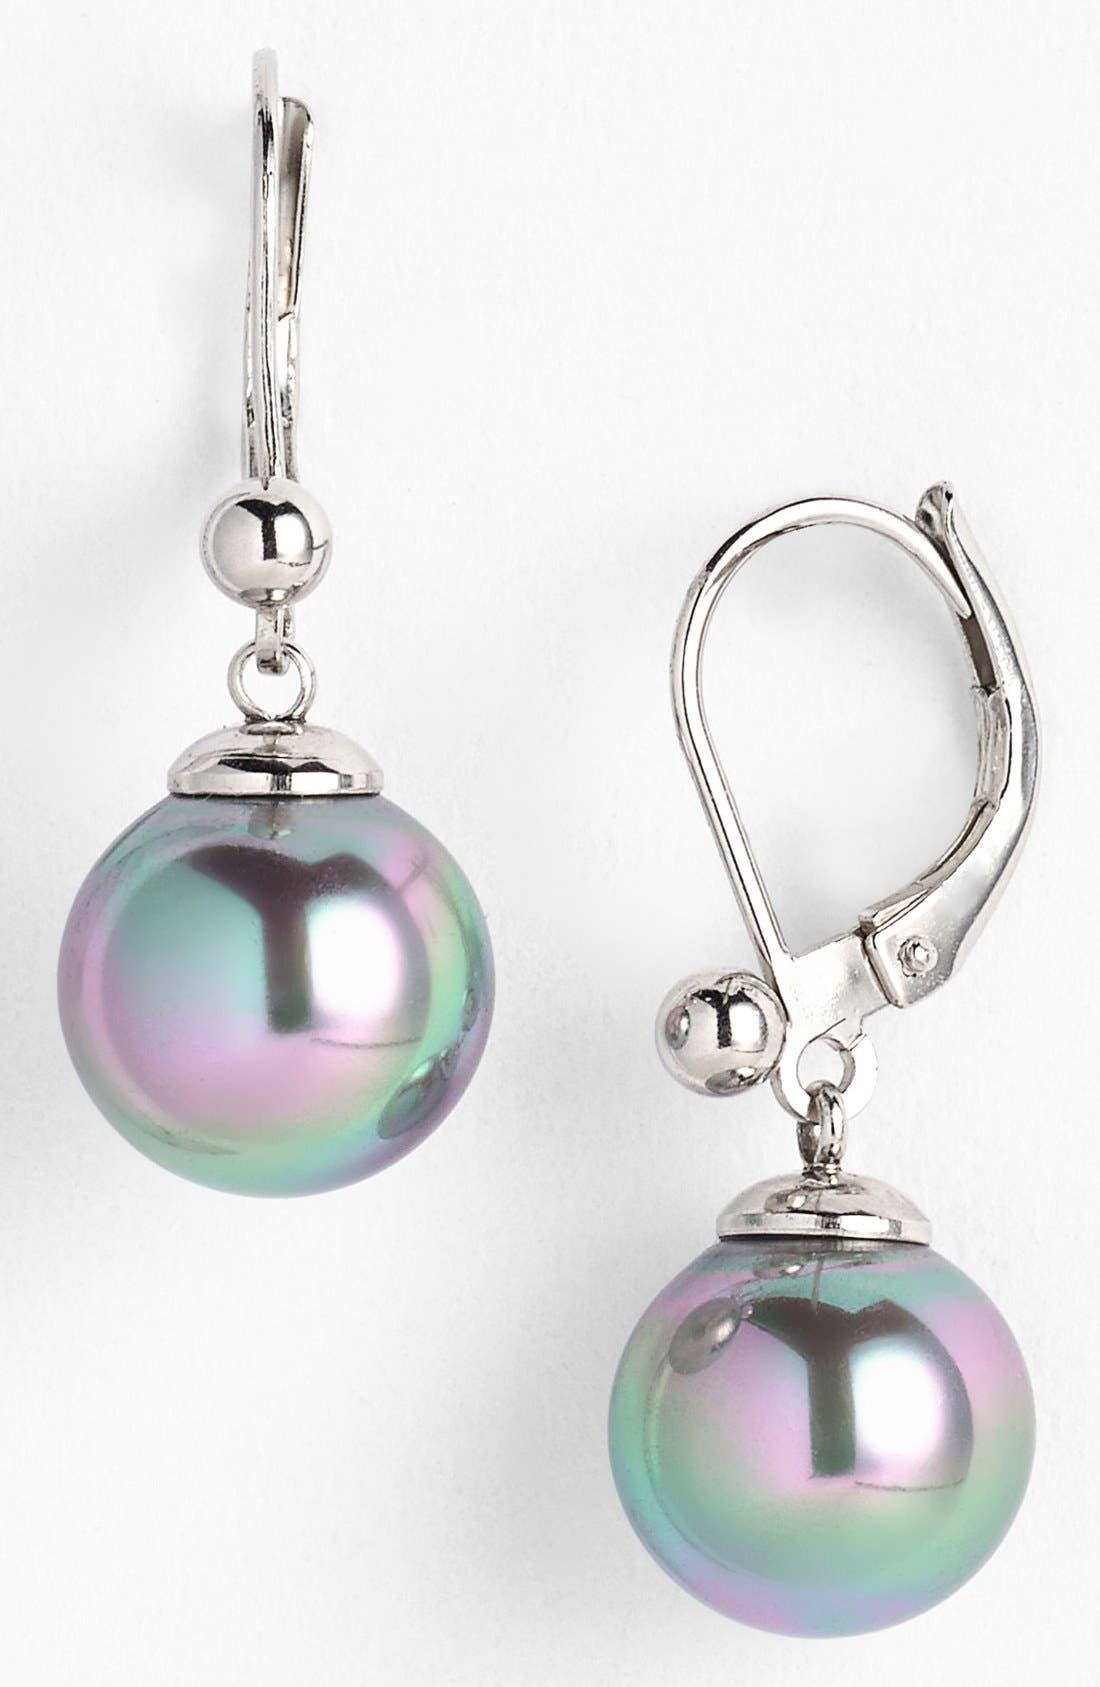 Simulated Pearl Drop Earrings,                             Main thumbnail 1, color,                             SILVER/ GREY PEARL